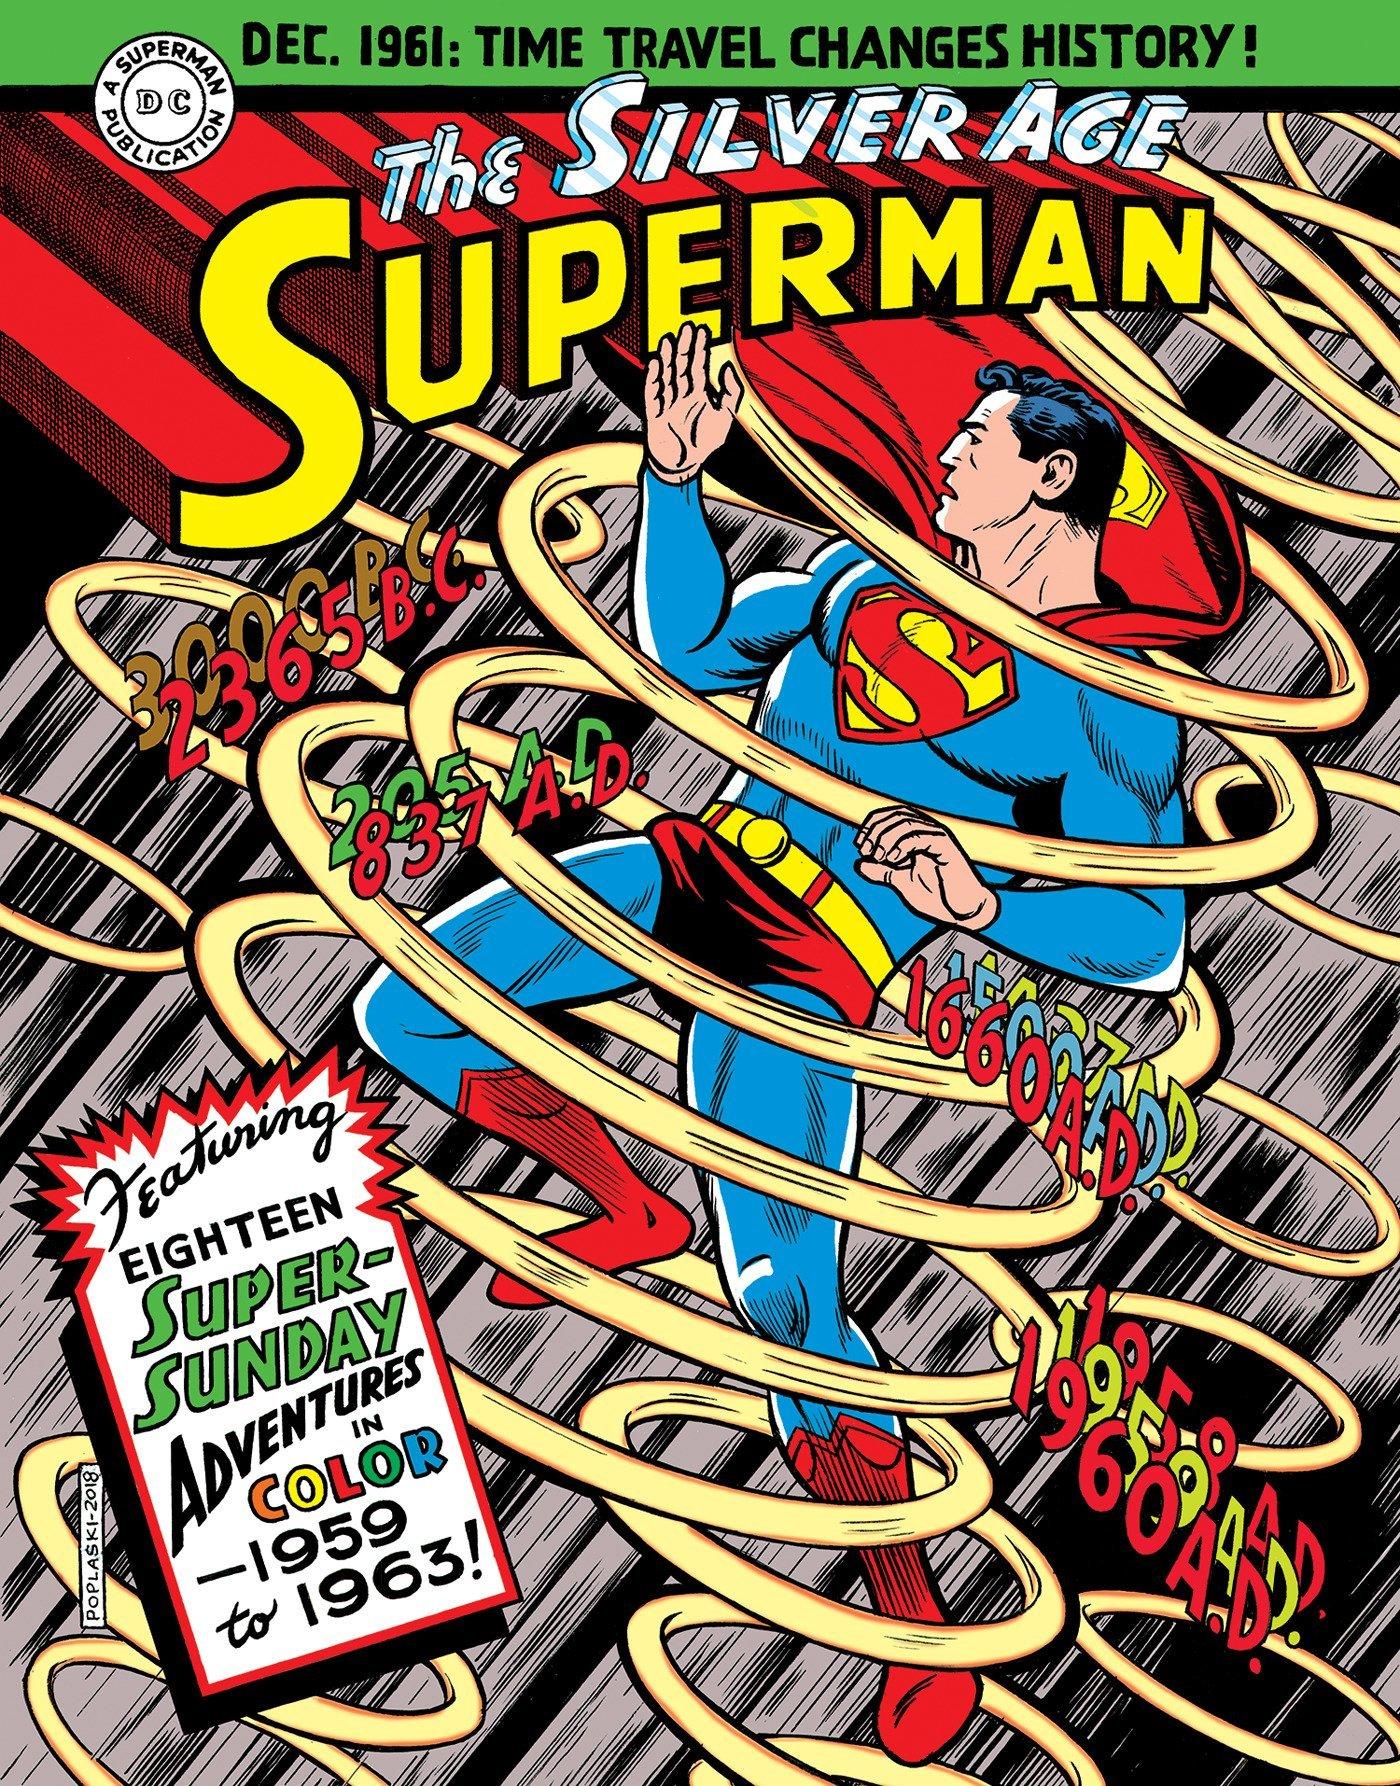 Superman  The Silver Age Sundays Vol. 1  1959 1963  Superman Silver Age Sundays Band 1